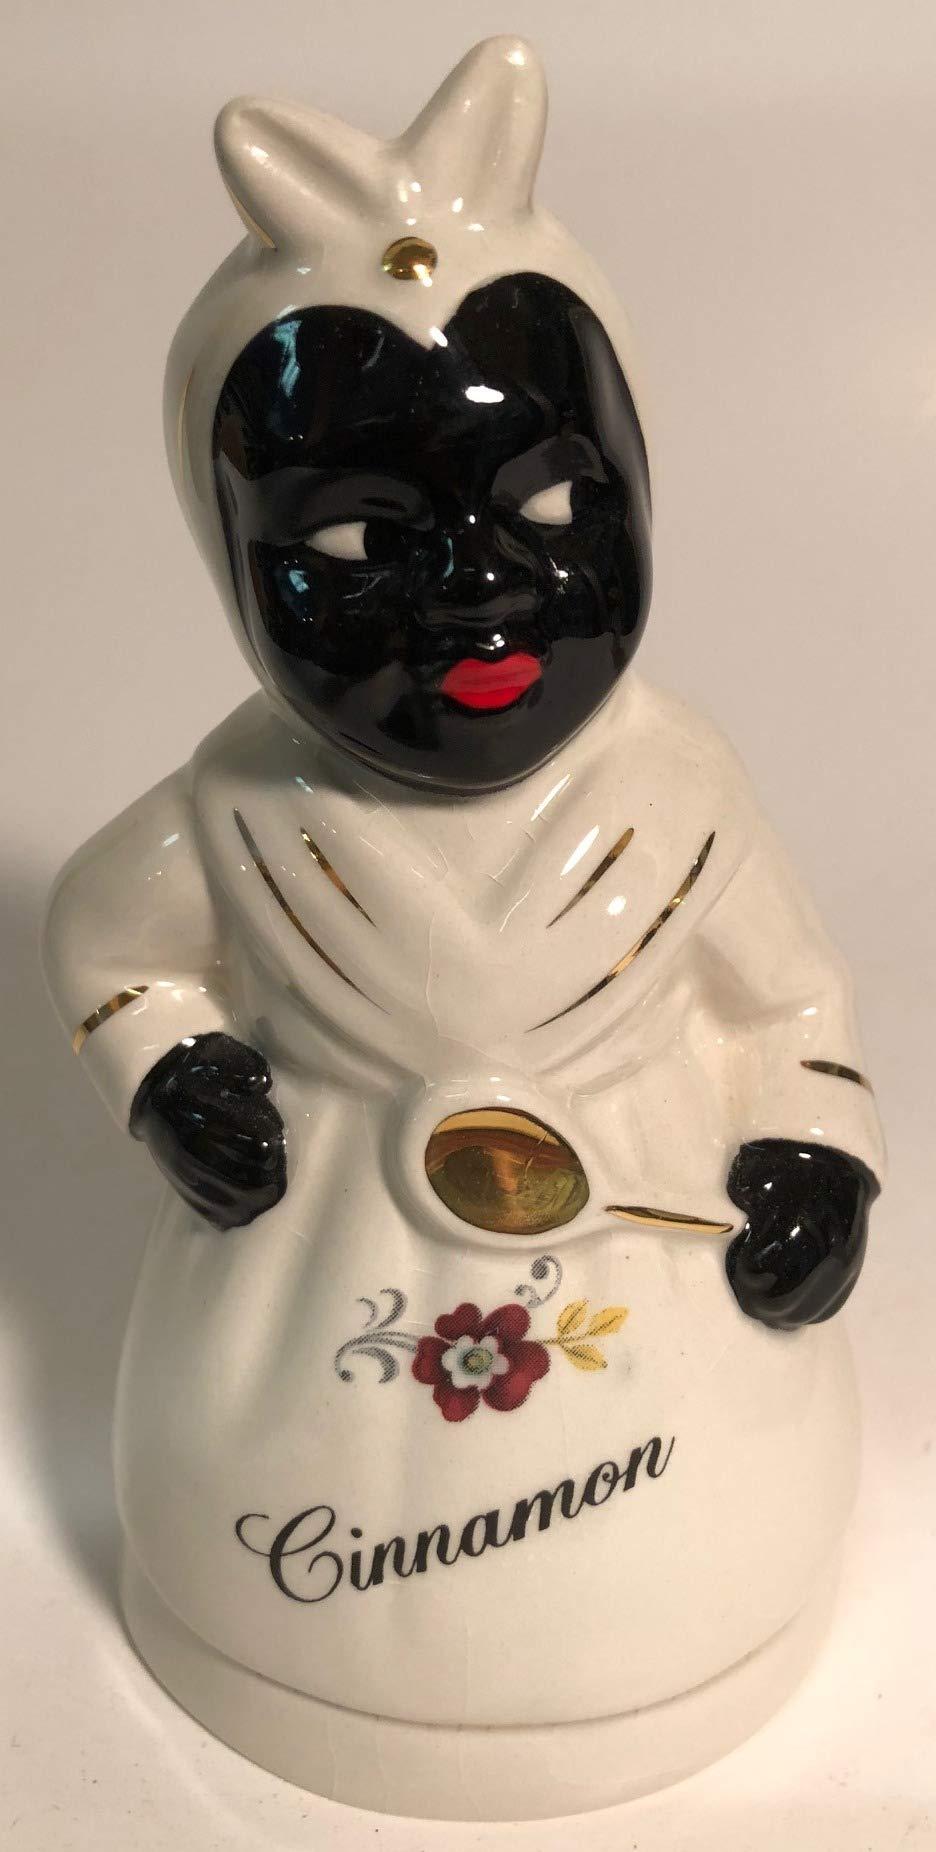 Spice Shaker - Black Americana (White Aunt Jemima Cinnamon Floral)